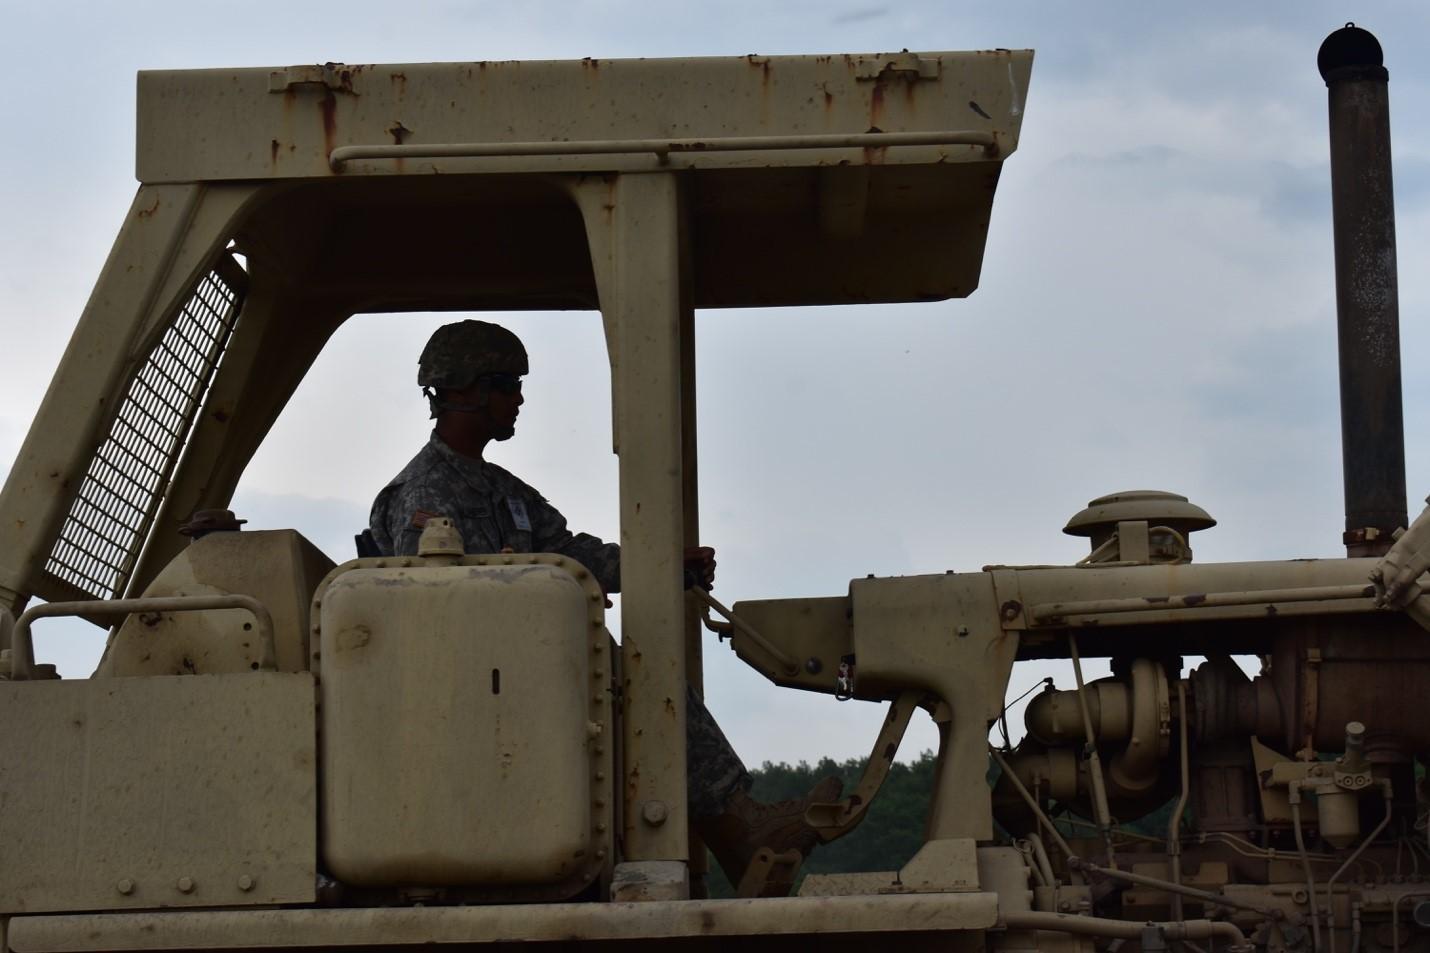 Resolute Castle 17 Soldier operates D7 Dozer